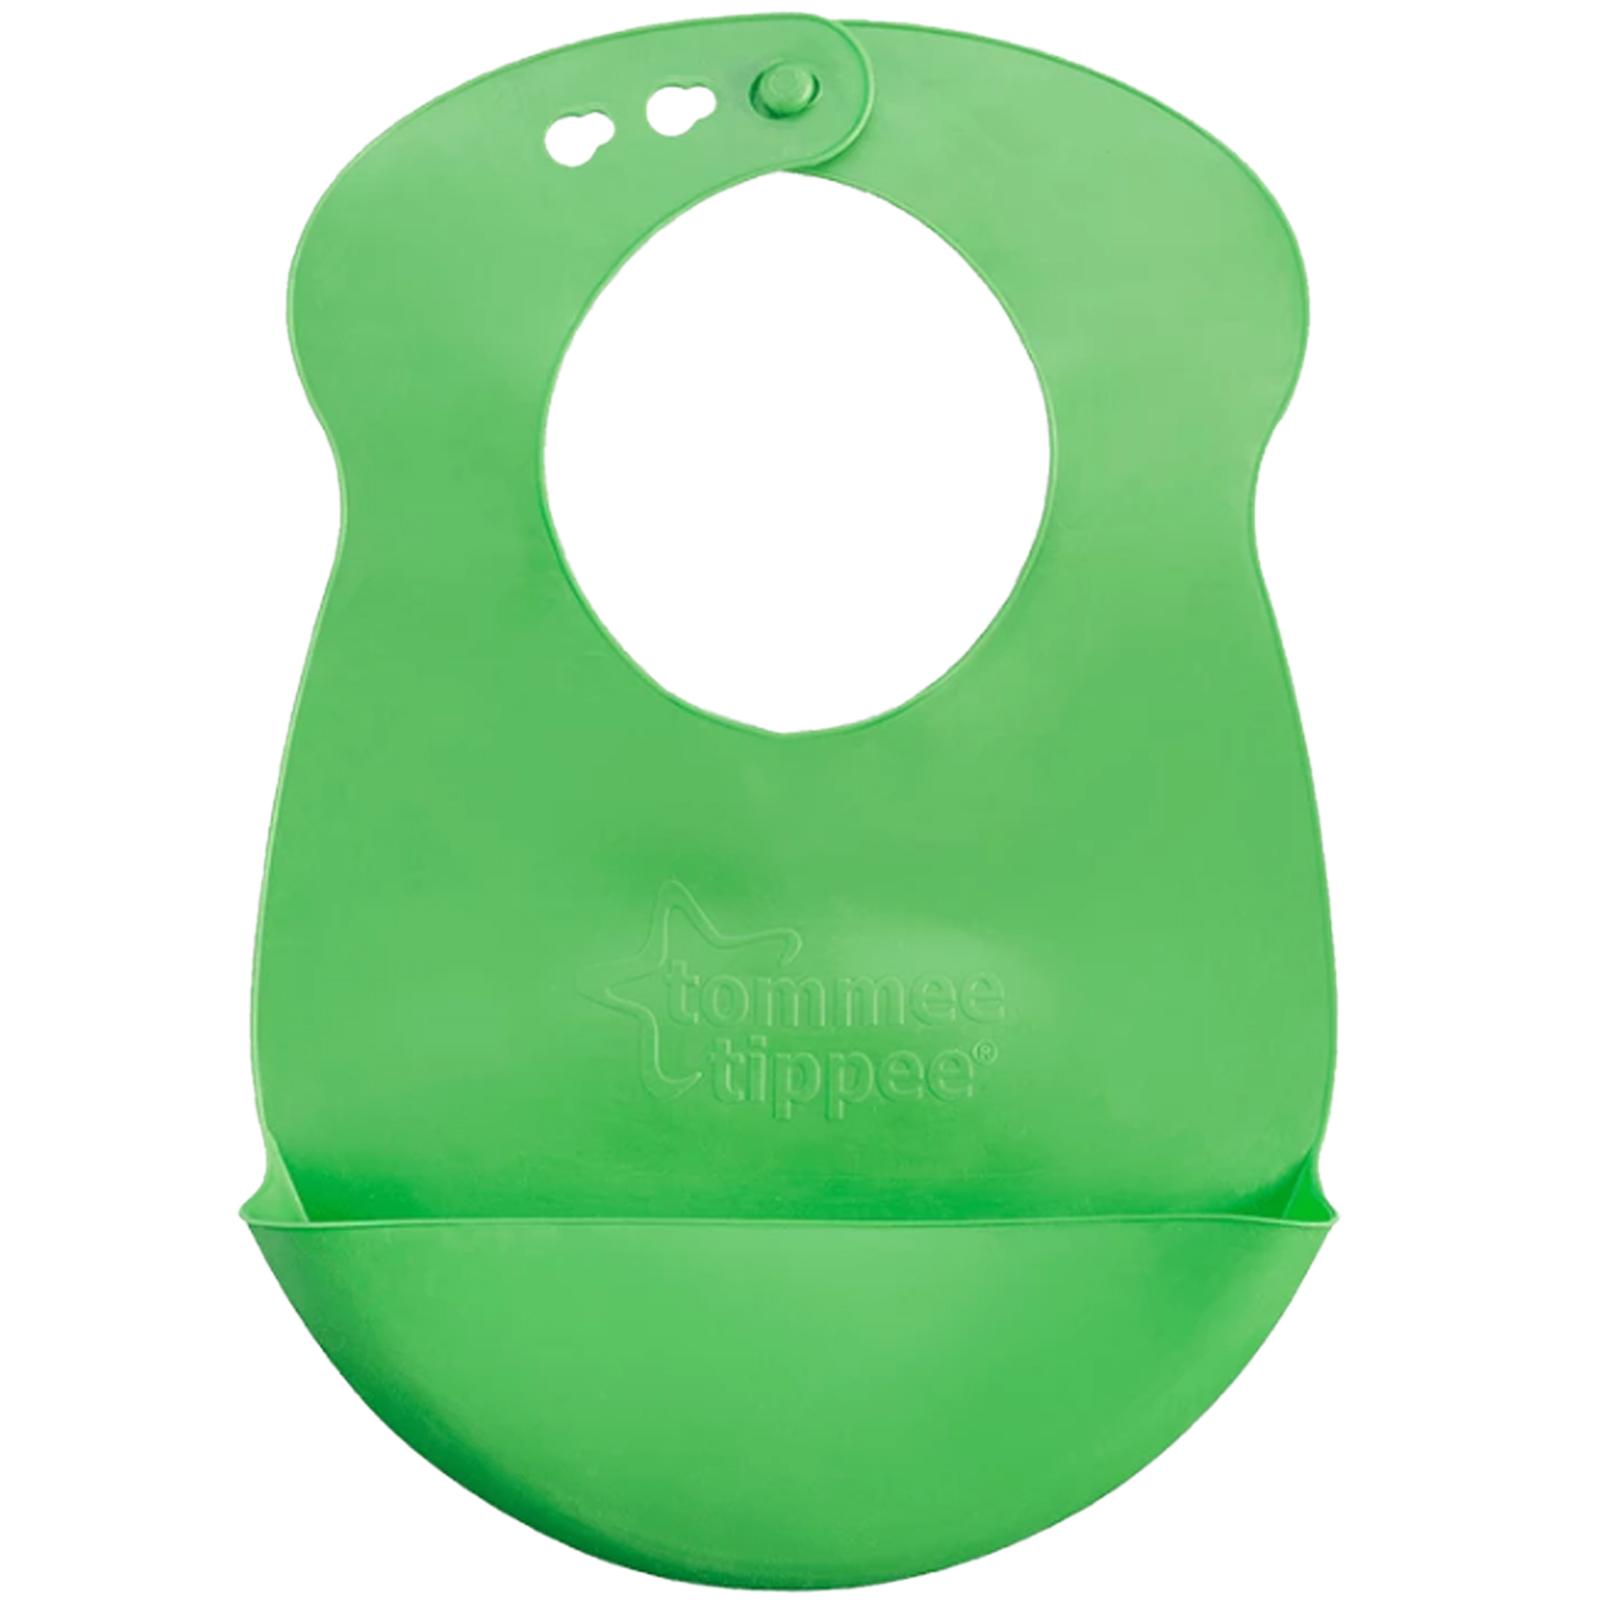 Гибкий нагрудник, зелёныйНагрудники<br>Гибкий нагрудник, зелёный<br>